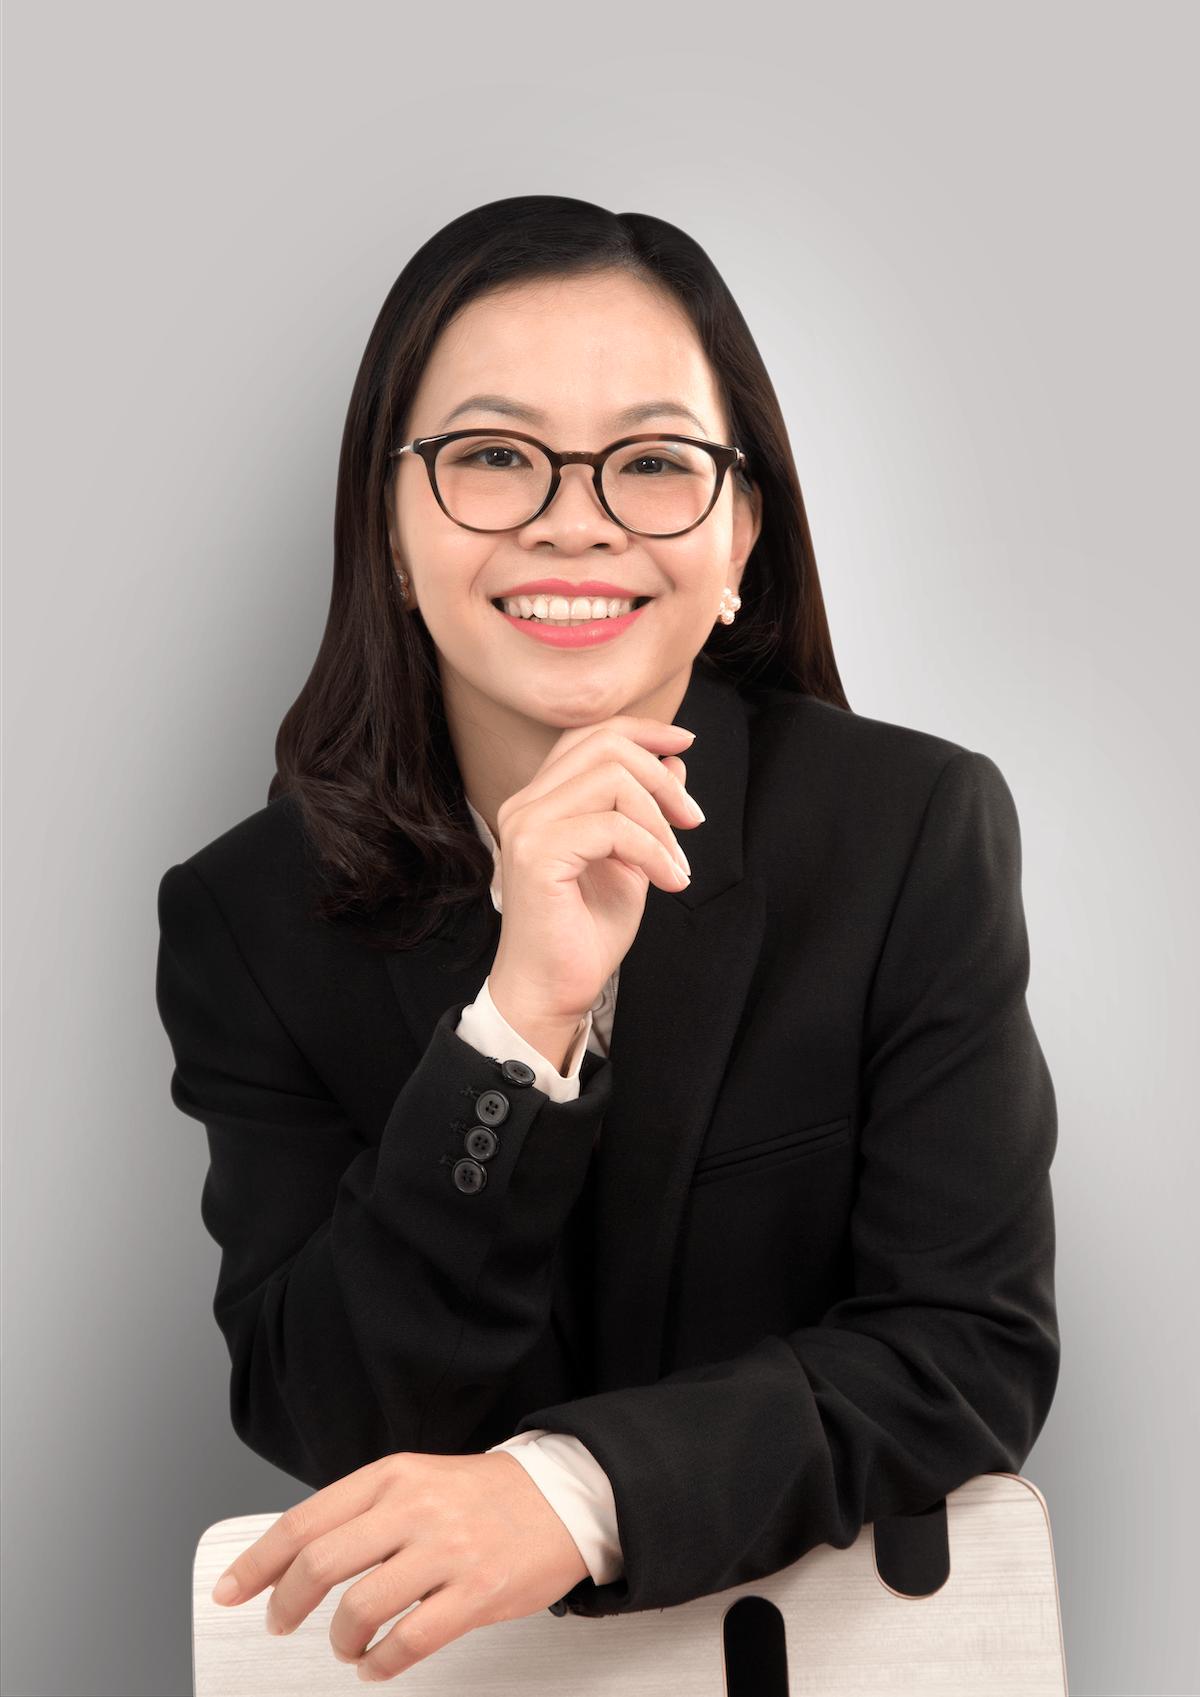 Tran Thu Hien, Associate Finance Director of Mondelez Kinh Do Vietnam. Photo by: Mondelez Kinh Do Vietnam